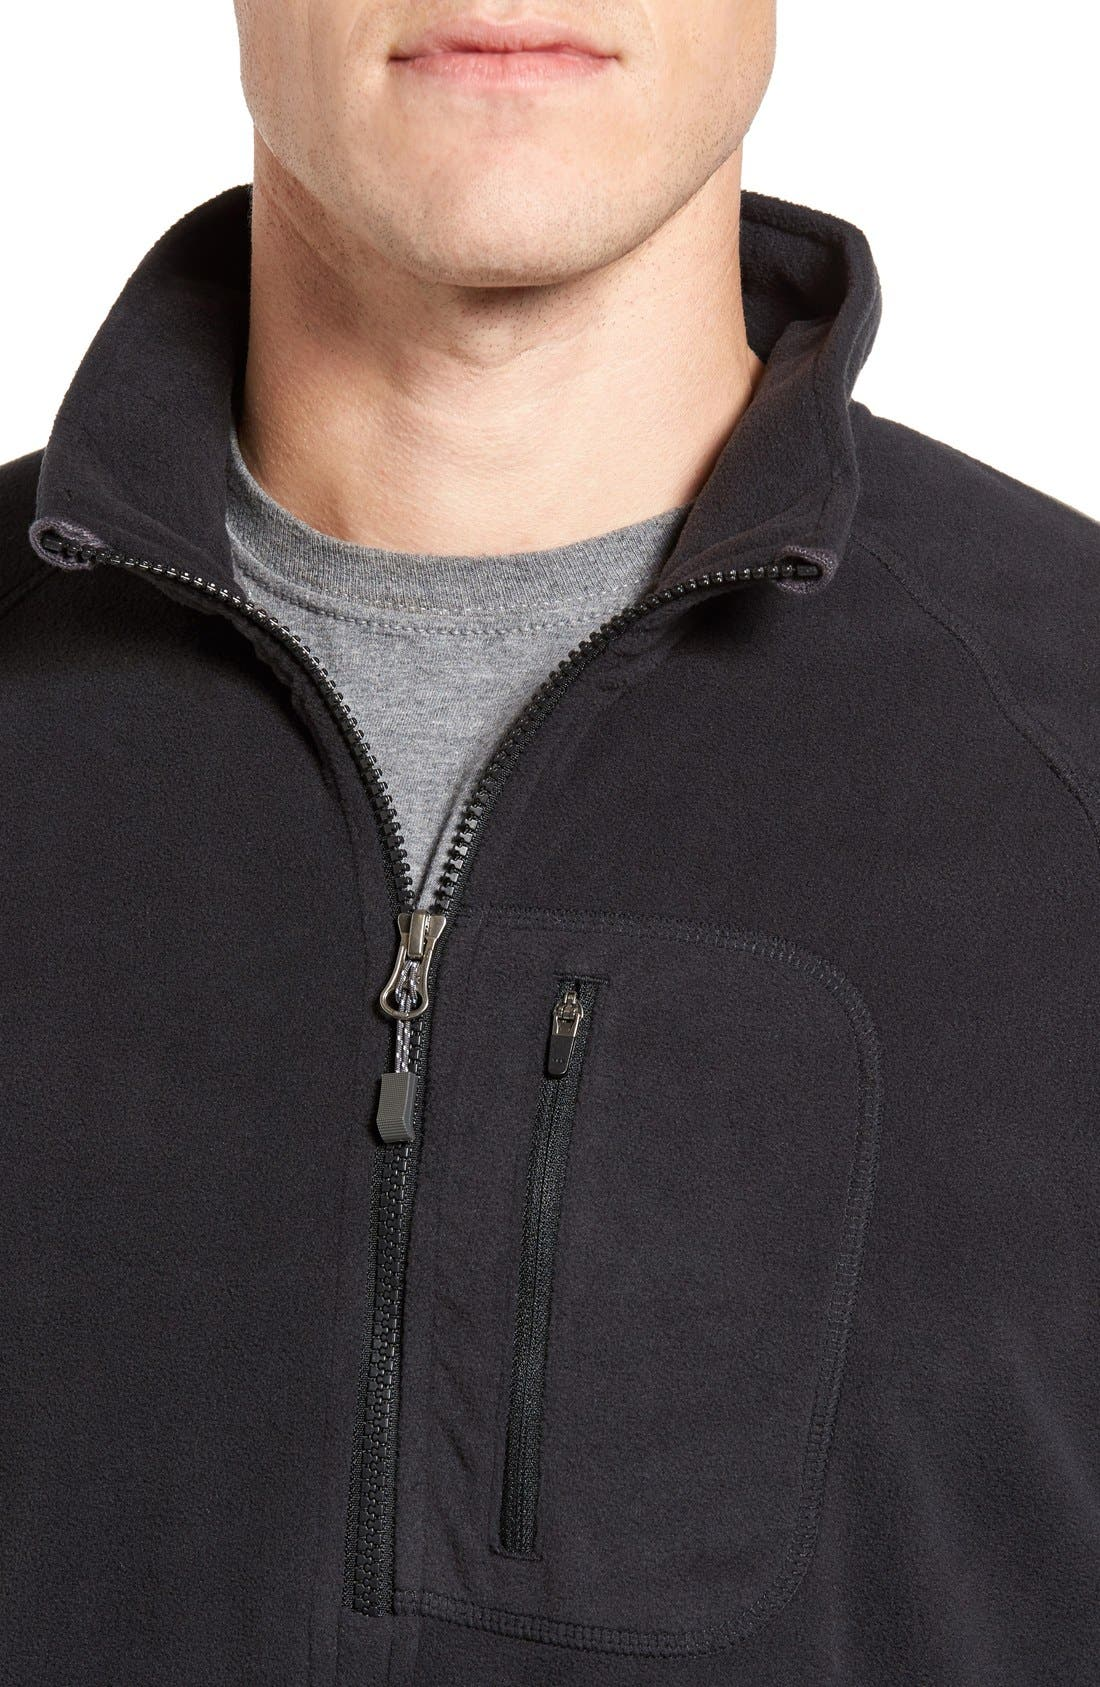 Utility Quarter Zip Fleece Sweater,                             Alternate thumbnail 7, color,                             002